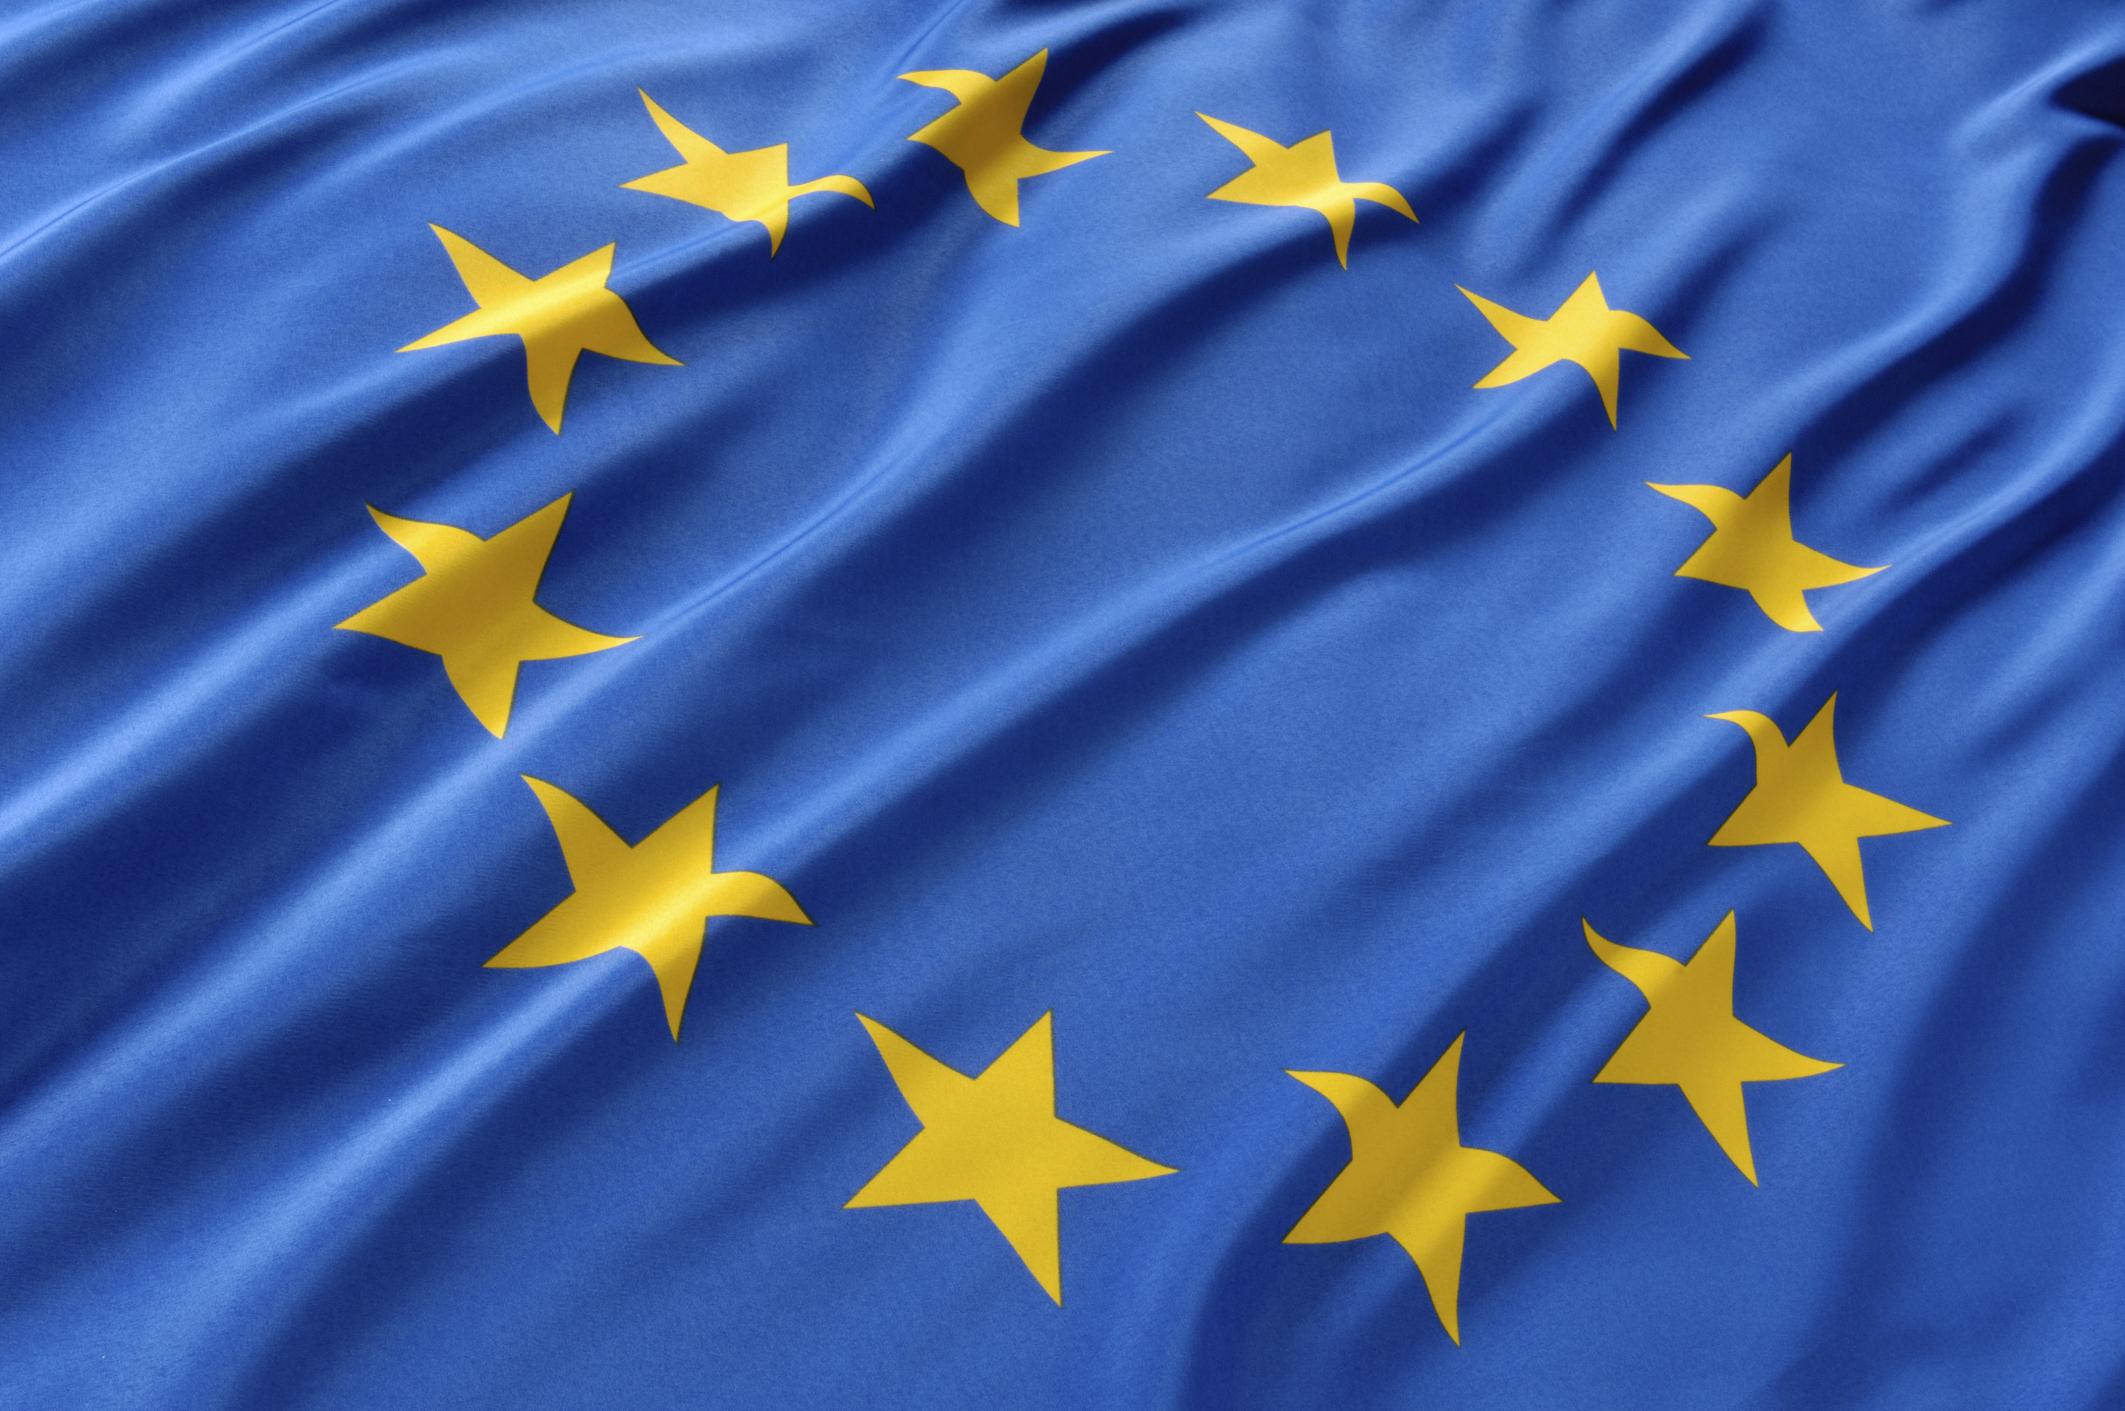 Clegg v Farage: European Debate live on LBC Radio, BBC Two TV